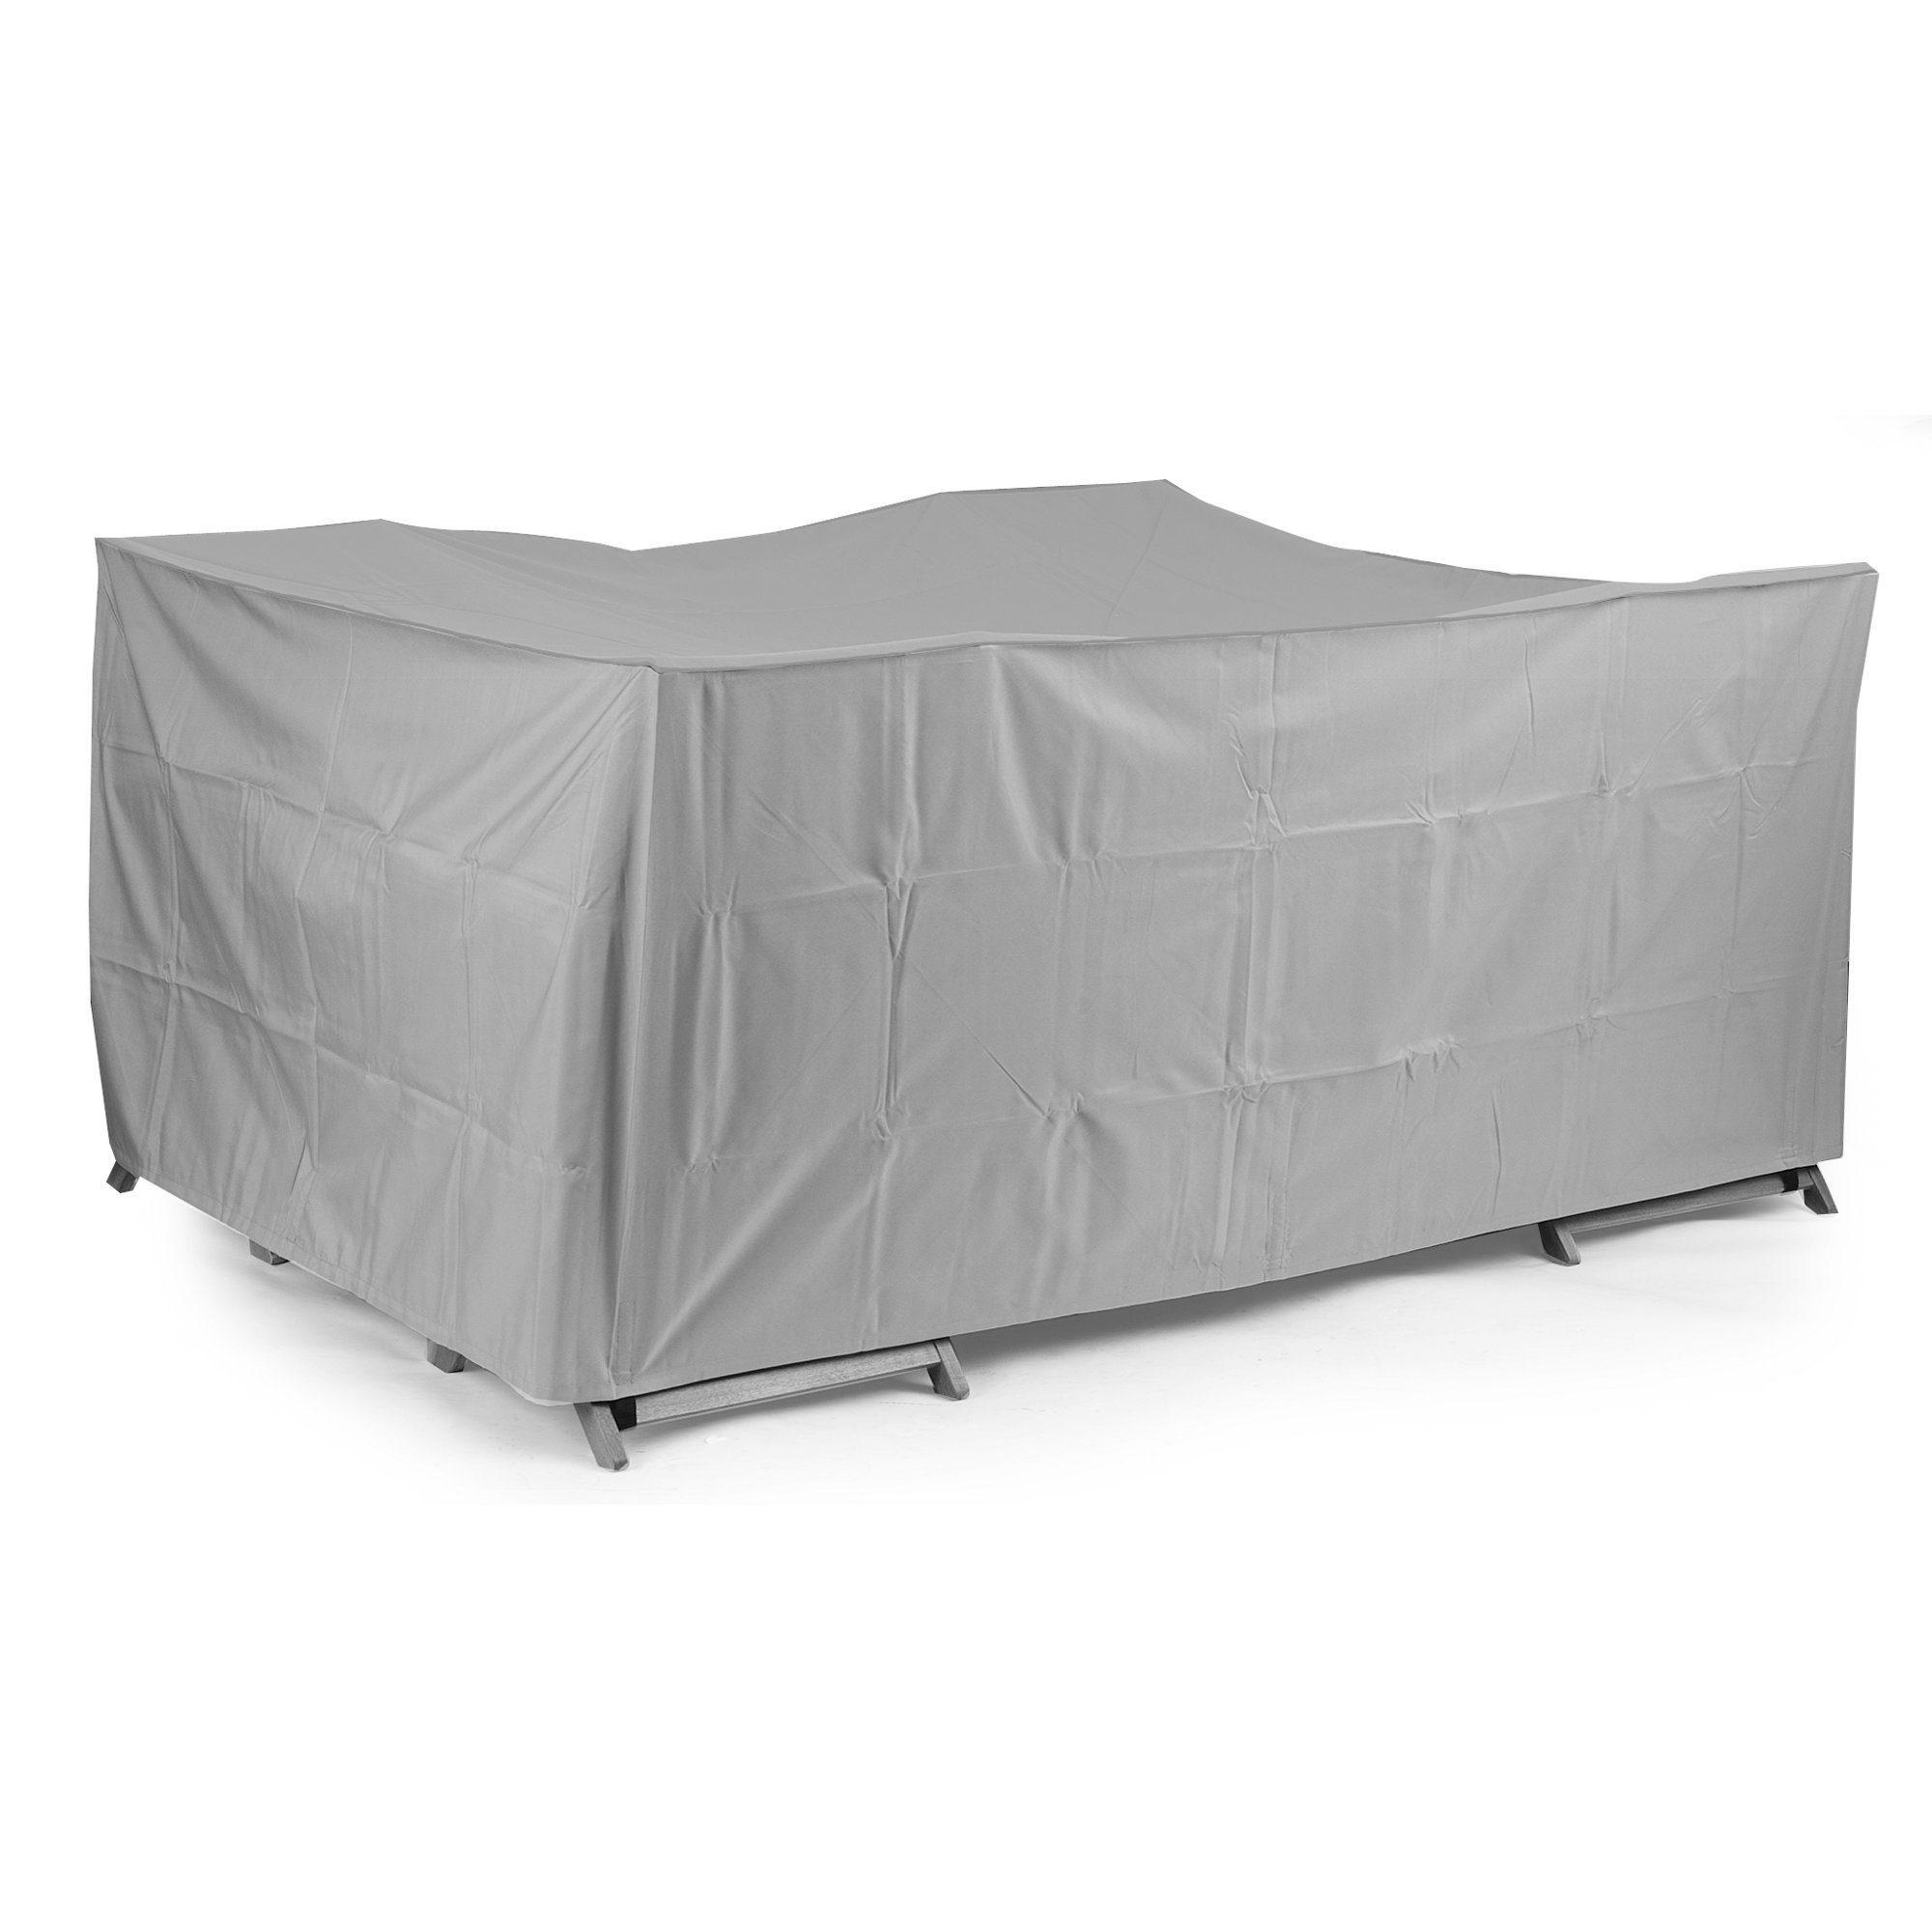 Möbelskydd 165x200 cm, höjd 88 cm